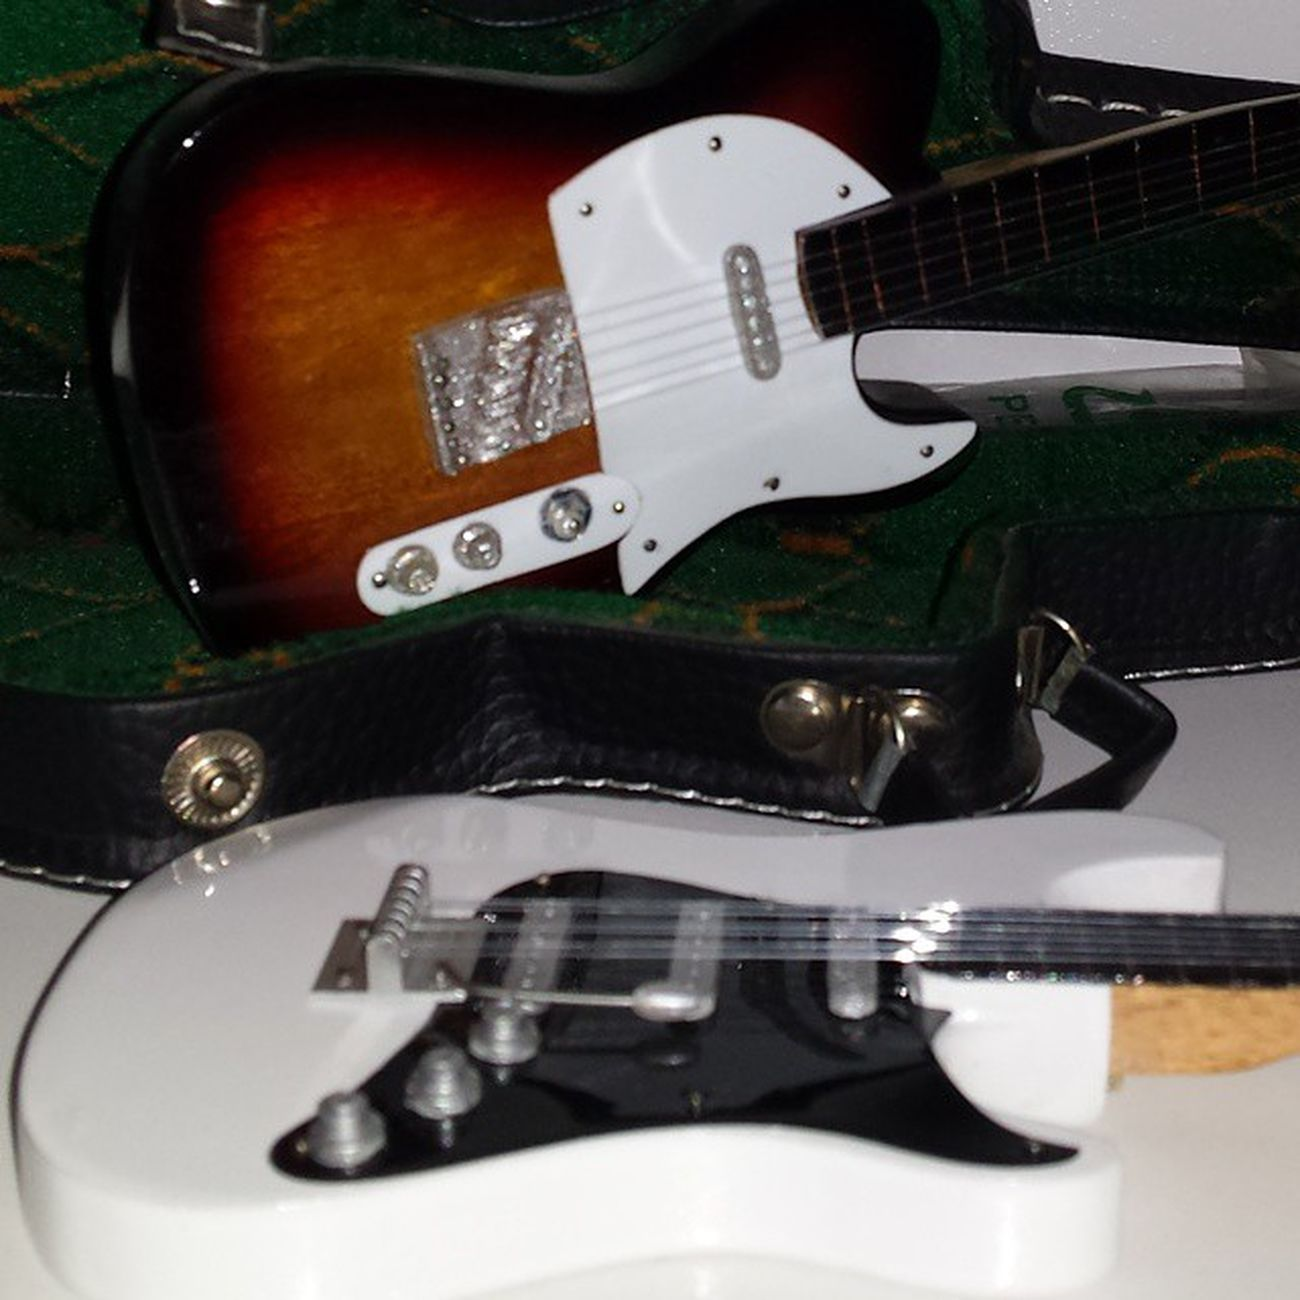 Guitarra Guitarraelectrica Guitarradecoracion Blanco Cuerdas 2 Samuelada